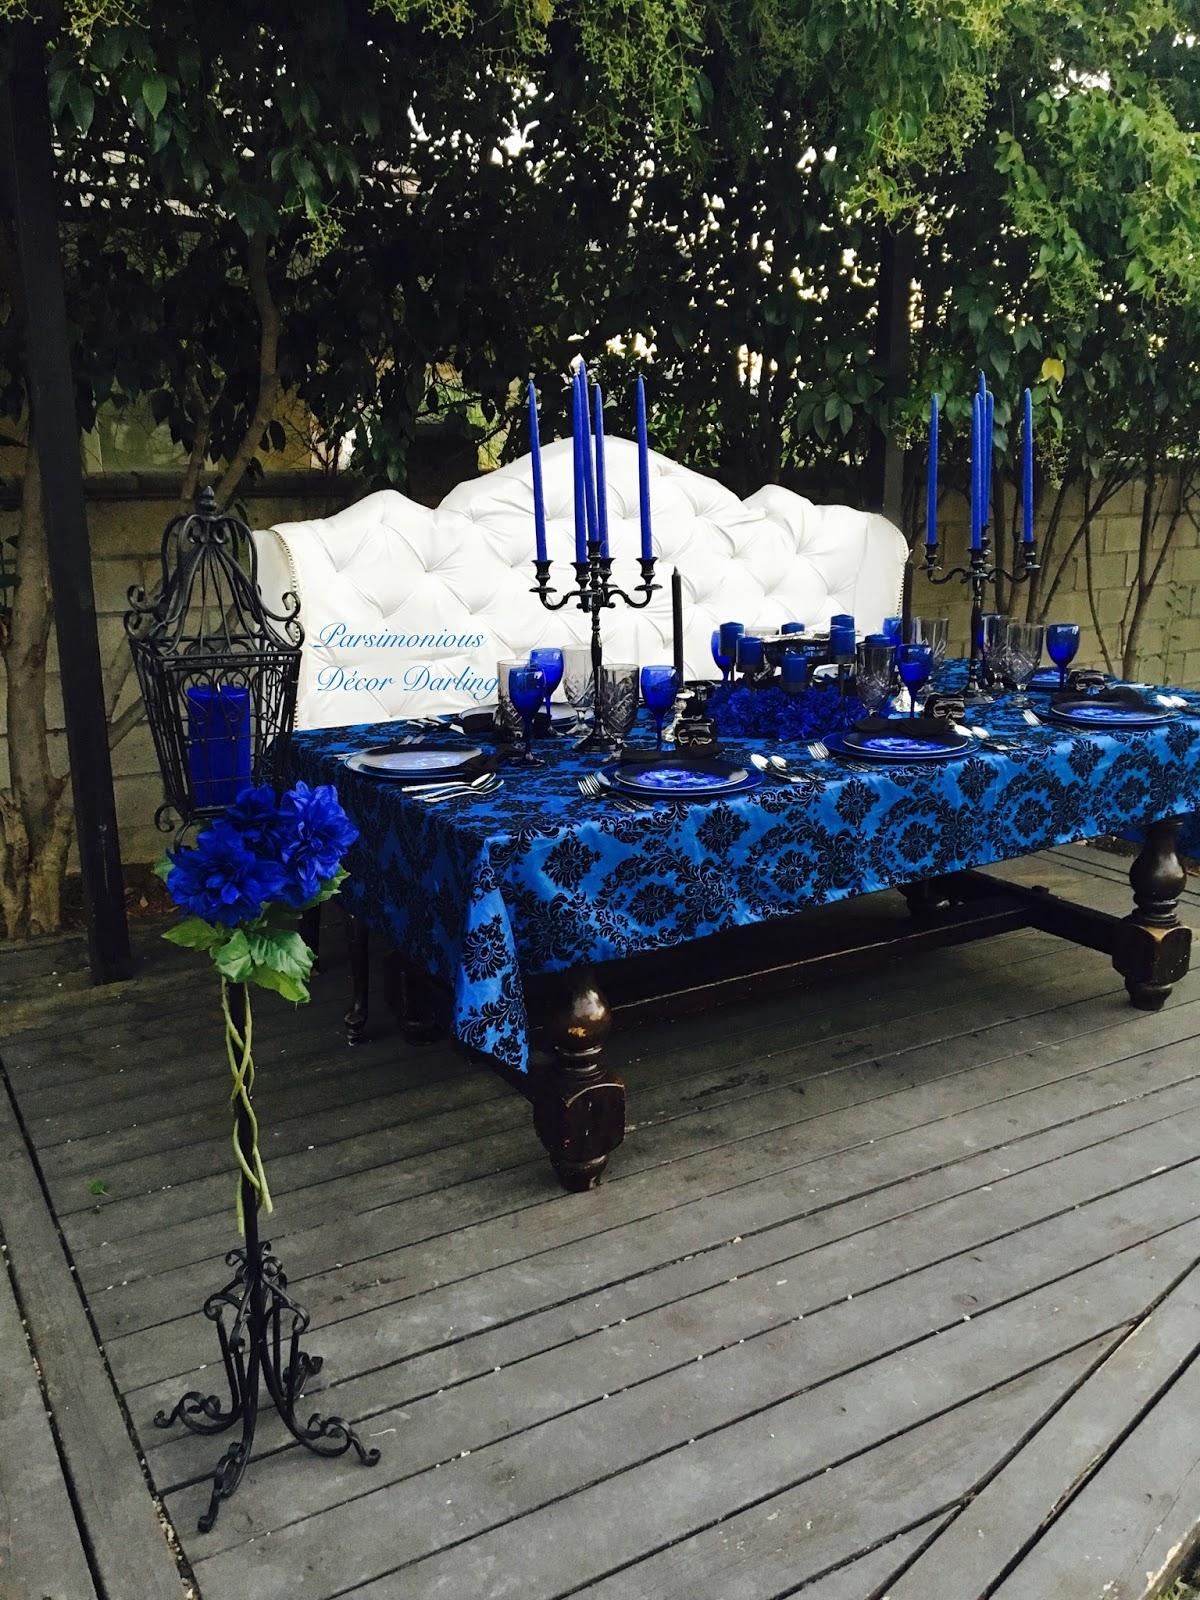 Parsimonious Décor Darling Set Your Table With Flair A